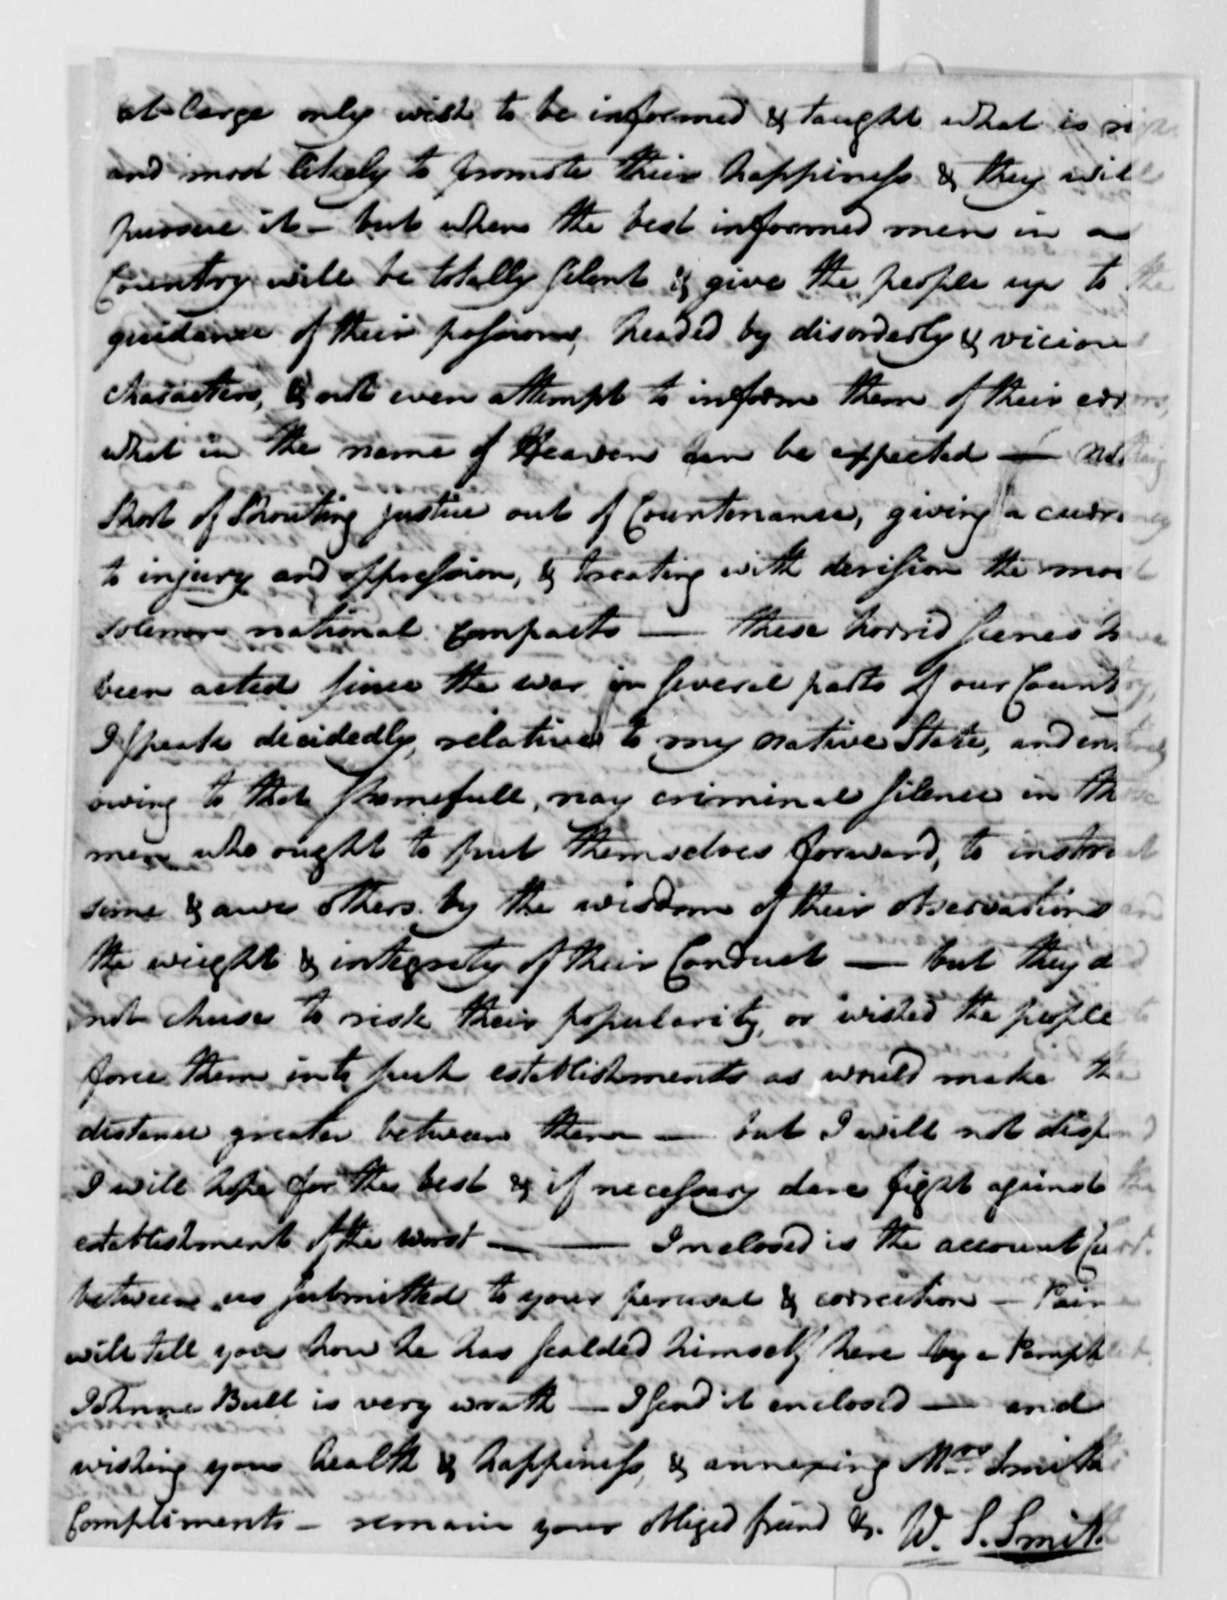 William S. Smith to Thomas Jefferson, December 3, 1787